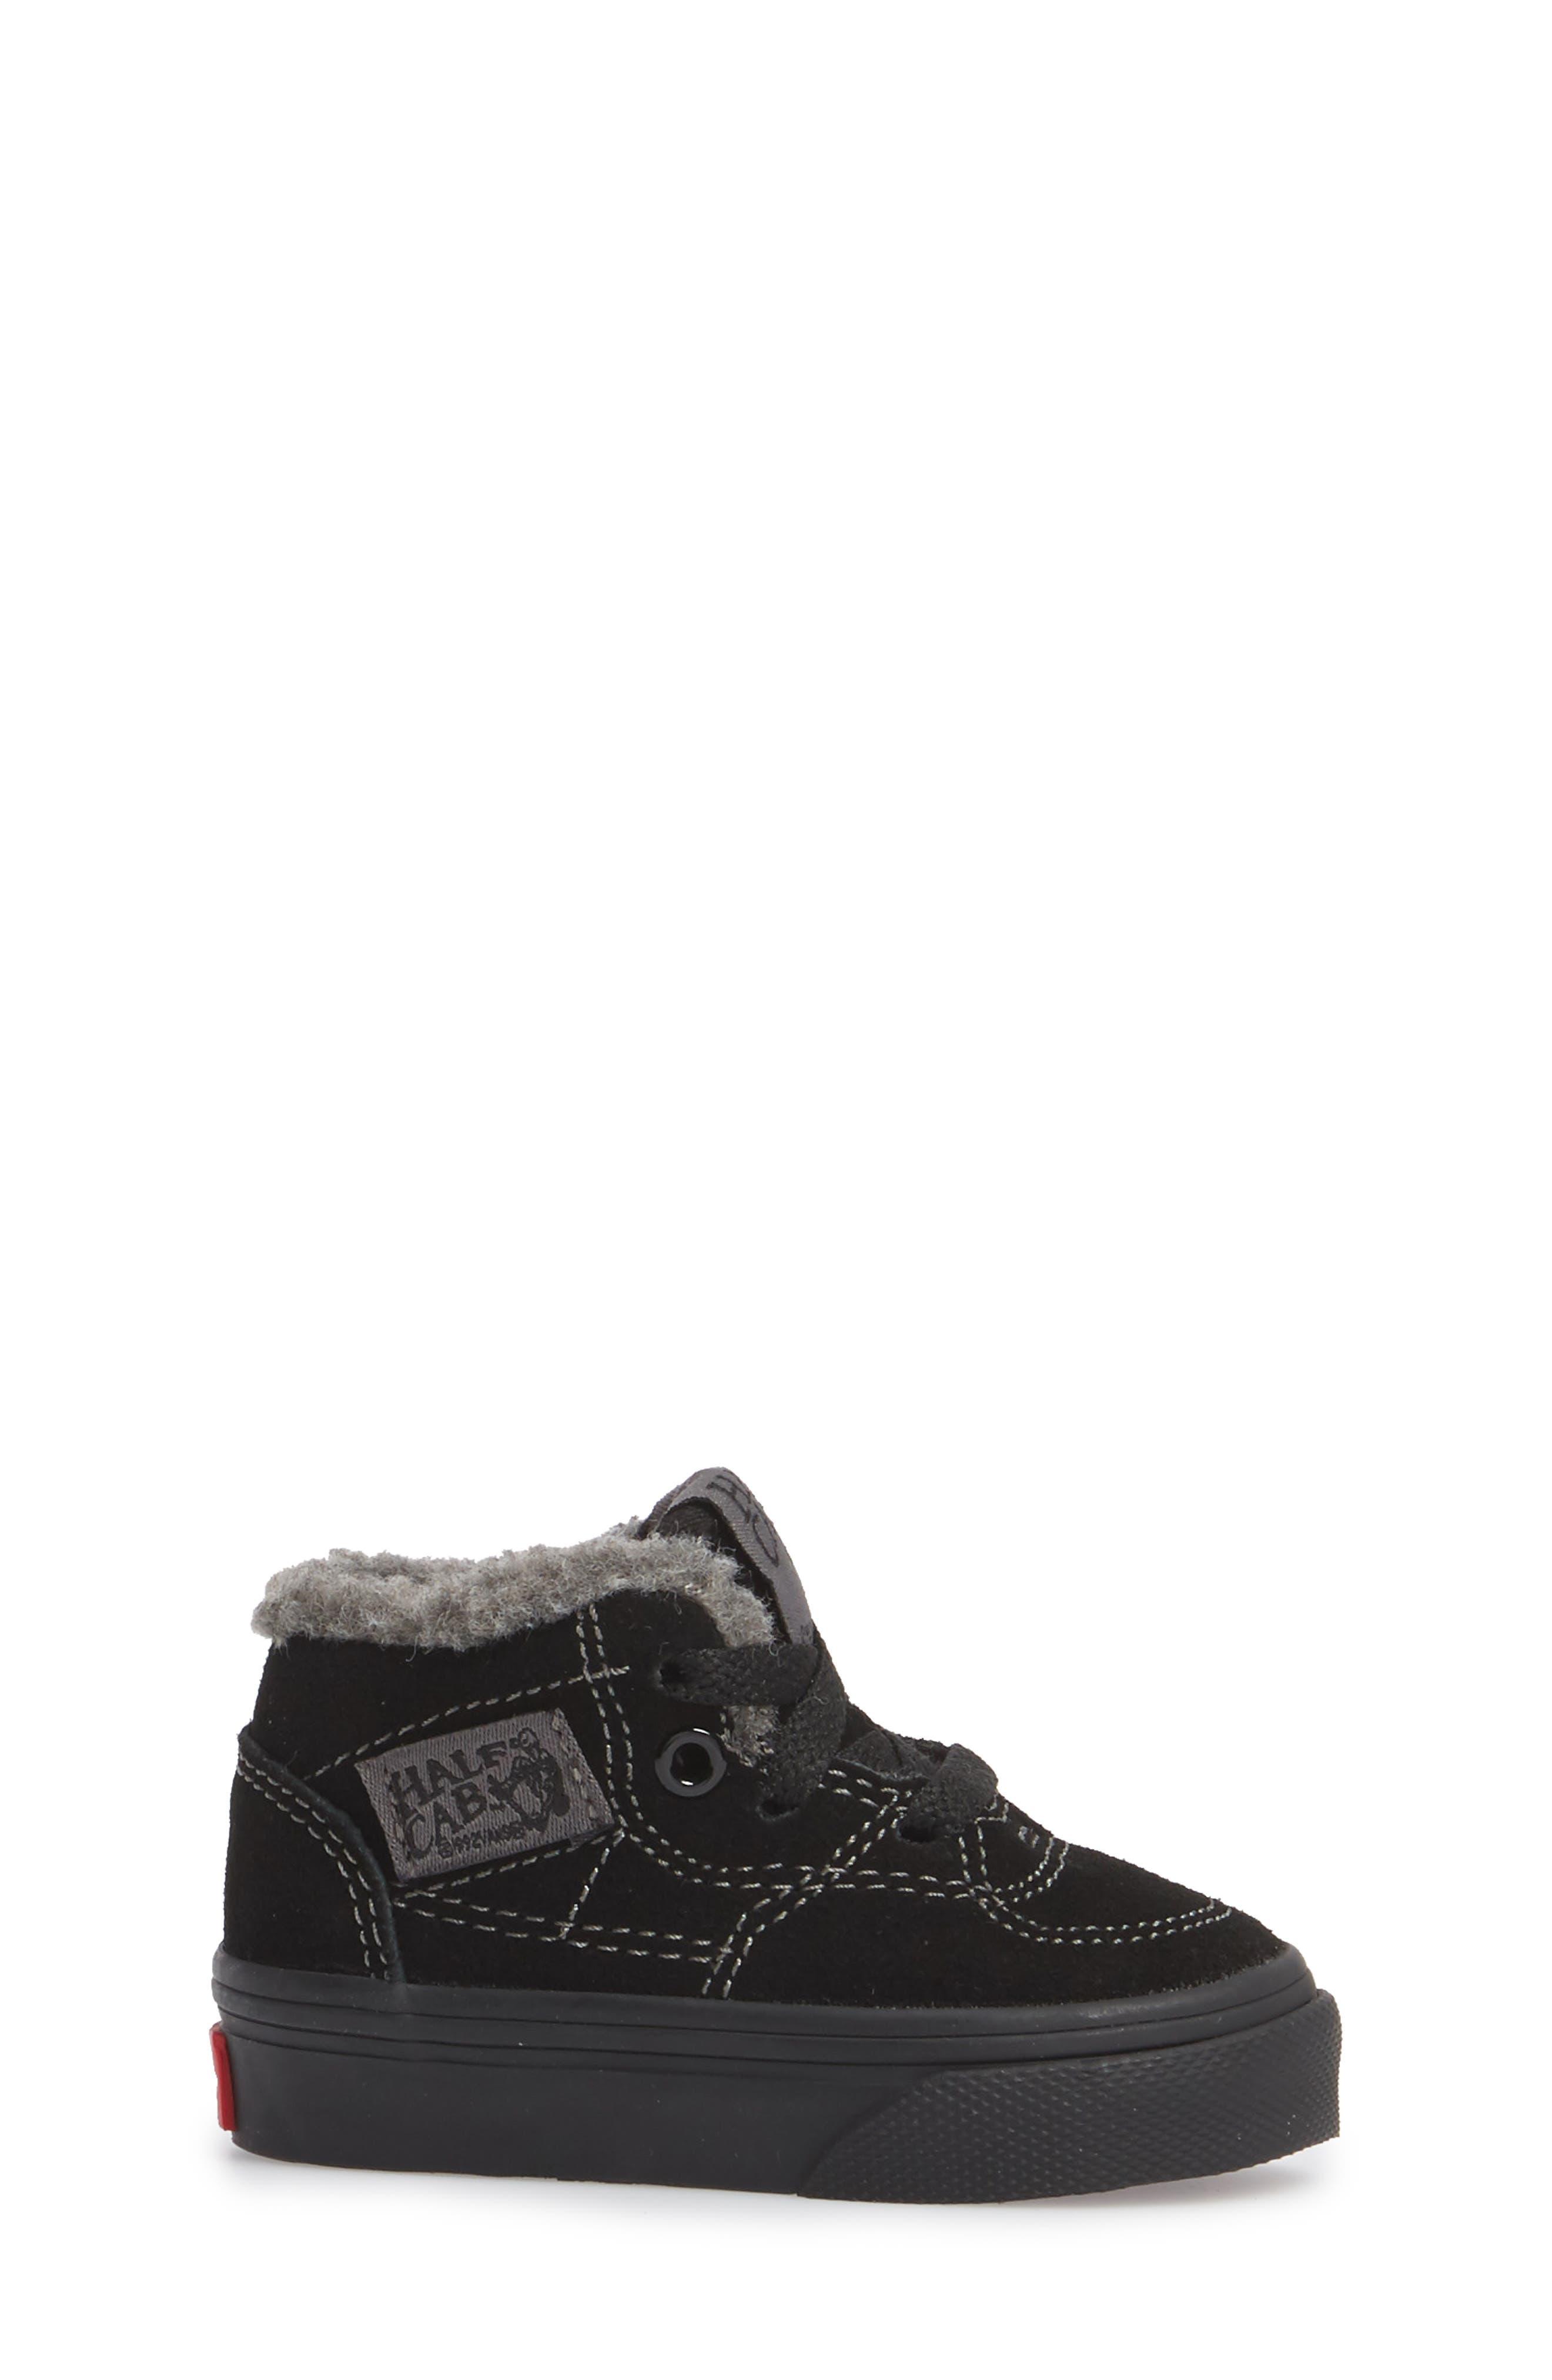 Alternate Image 3  - Vans Half Cab Sneaker (Baby, Walker & Toddler)